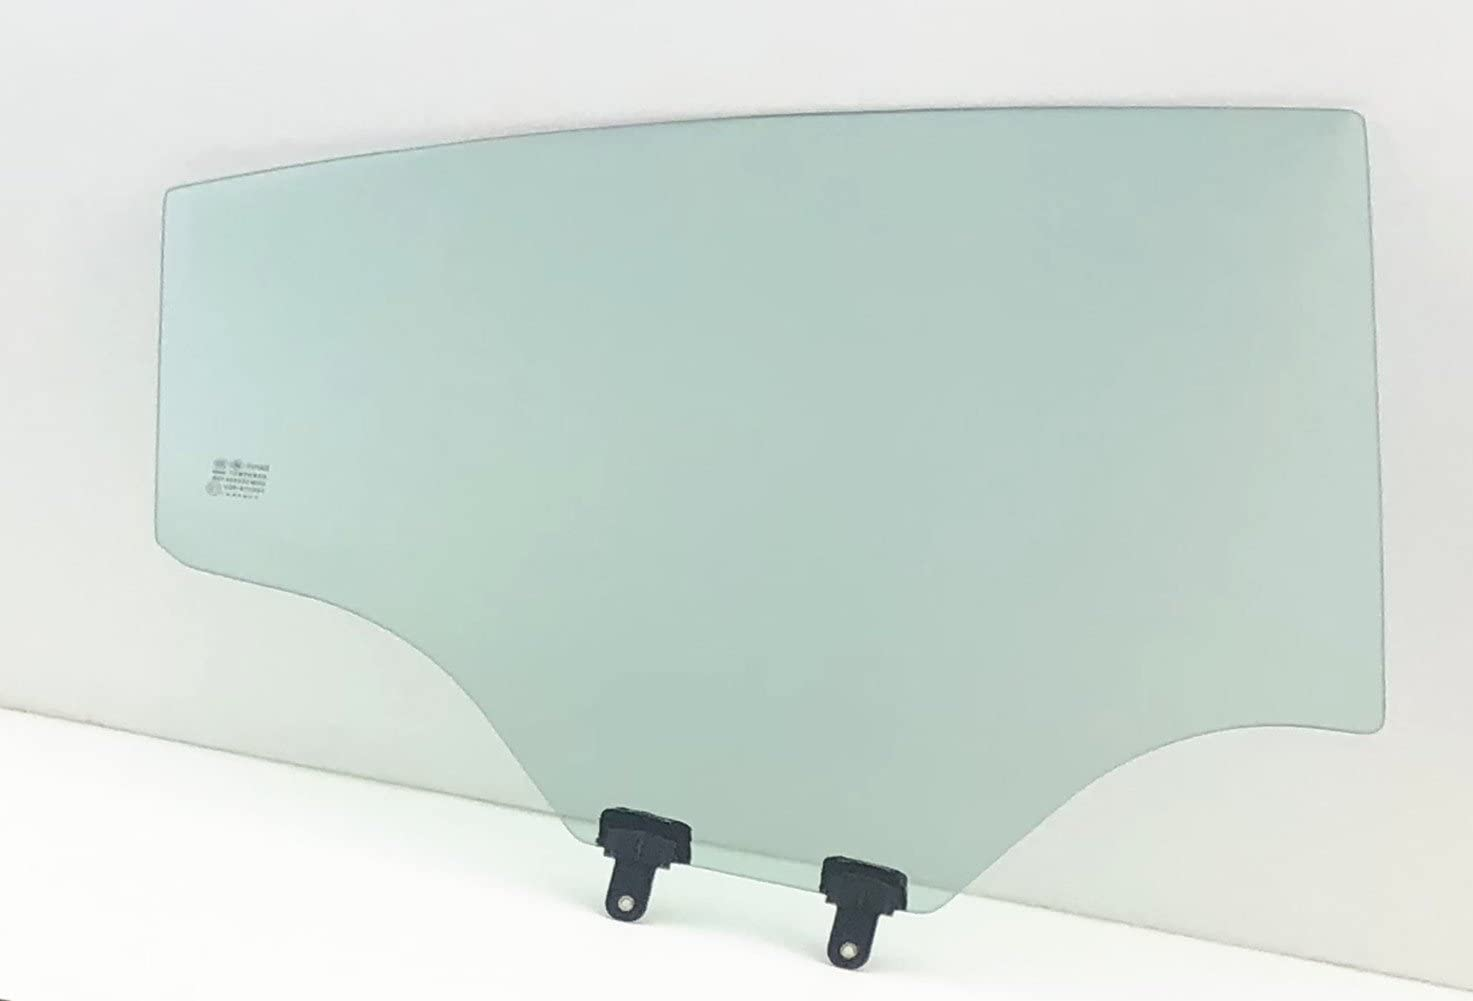 NAGD Fit 2007-2010 Kia Optima Passenger Right Side Rear Vent Window Glass